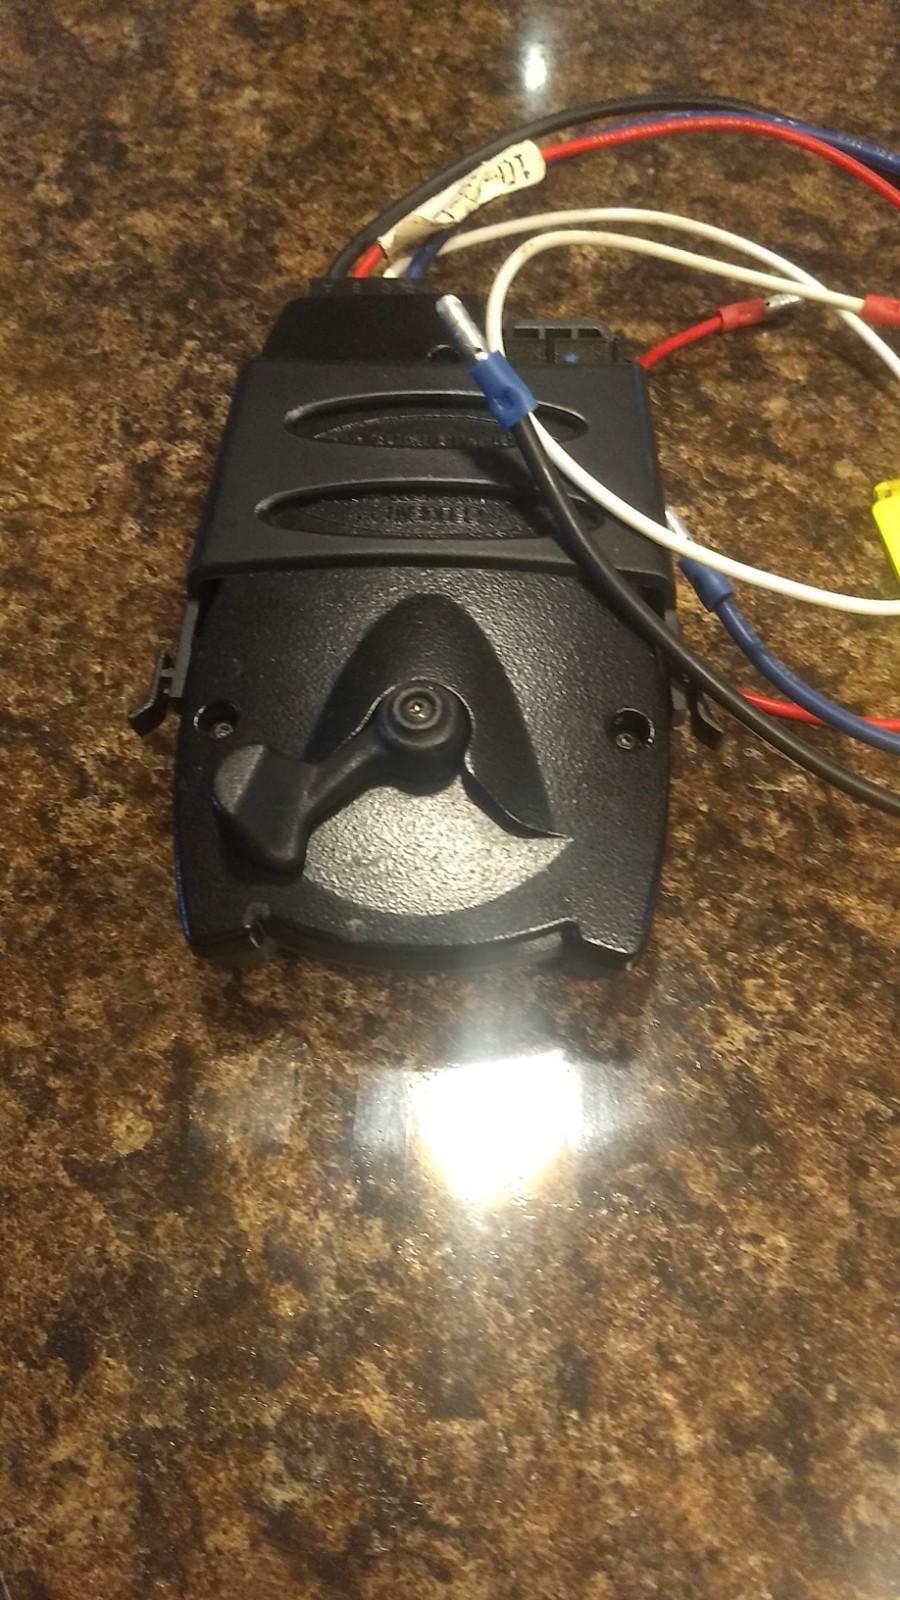 Prodigy P2 Brake Controller